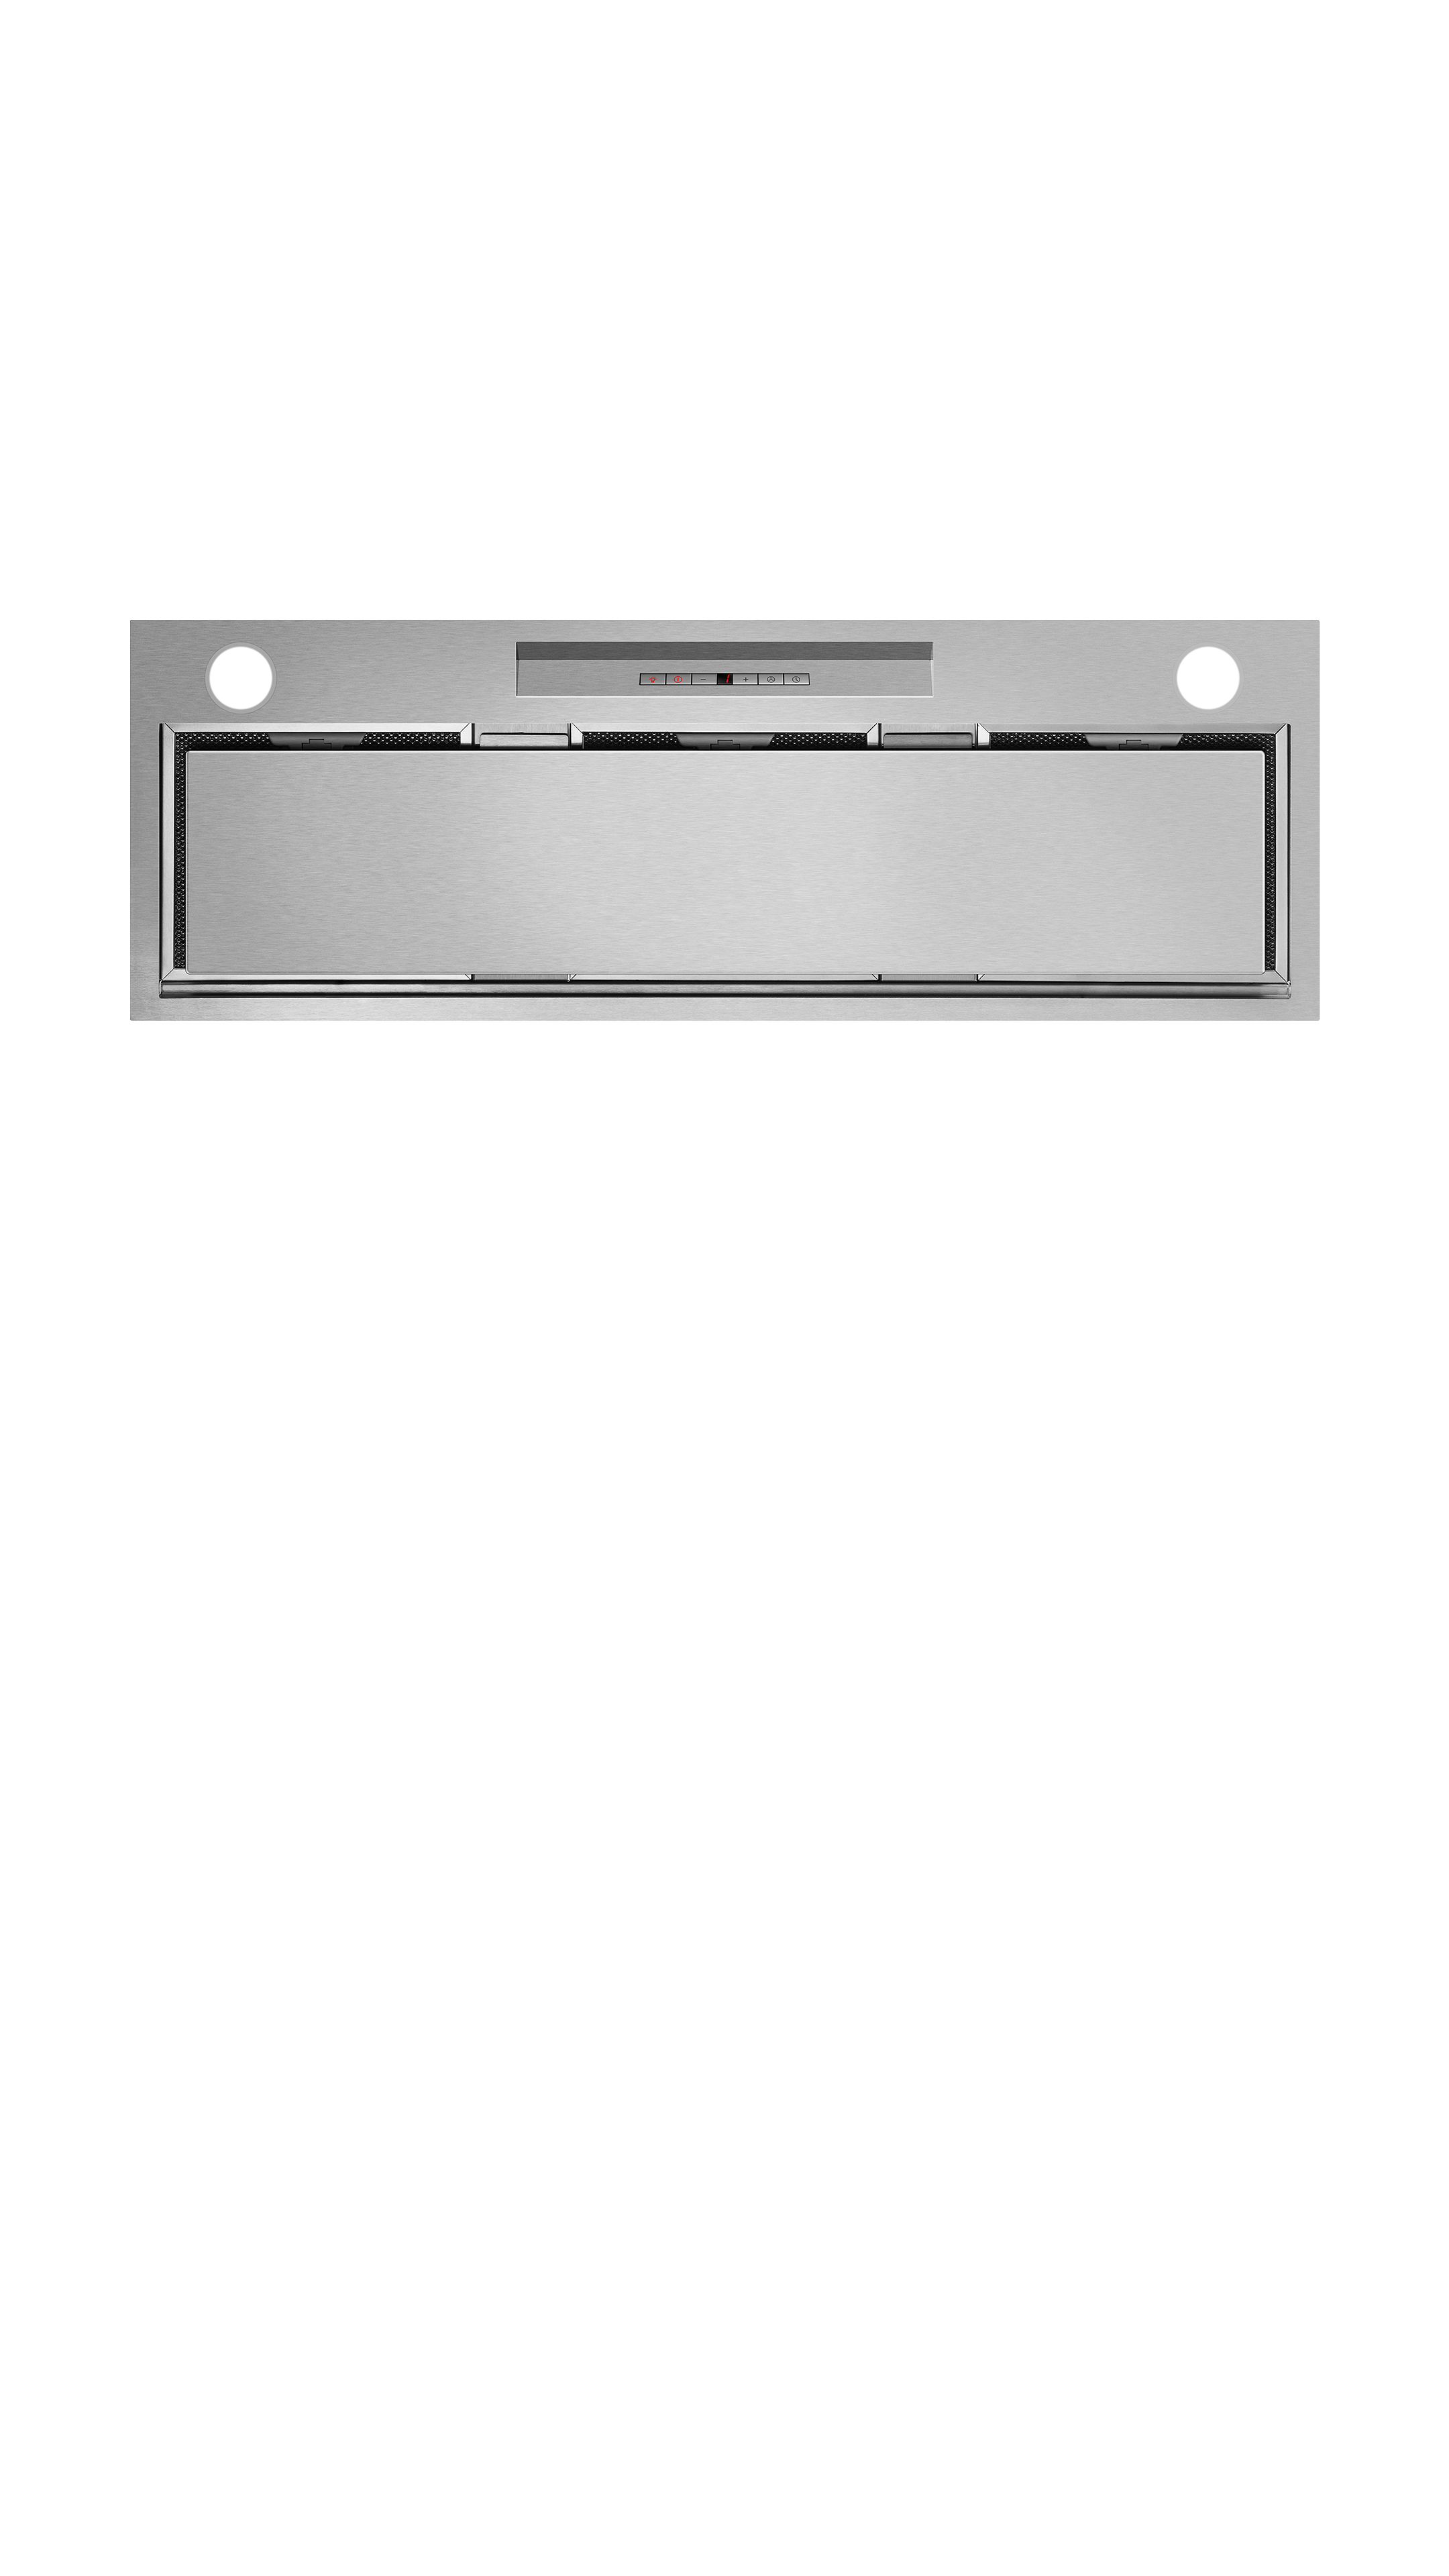 "Model: HP36ILTX1 | Fisher and Paykel Ventilation Hood, 36"", Perimeter Insert"